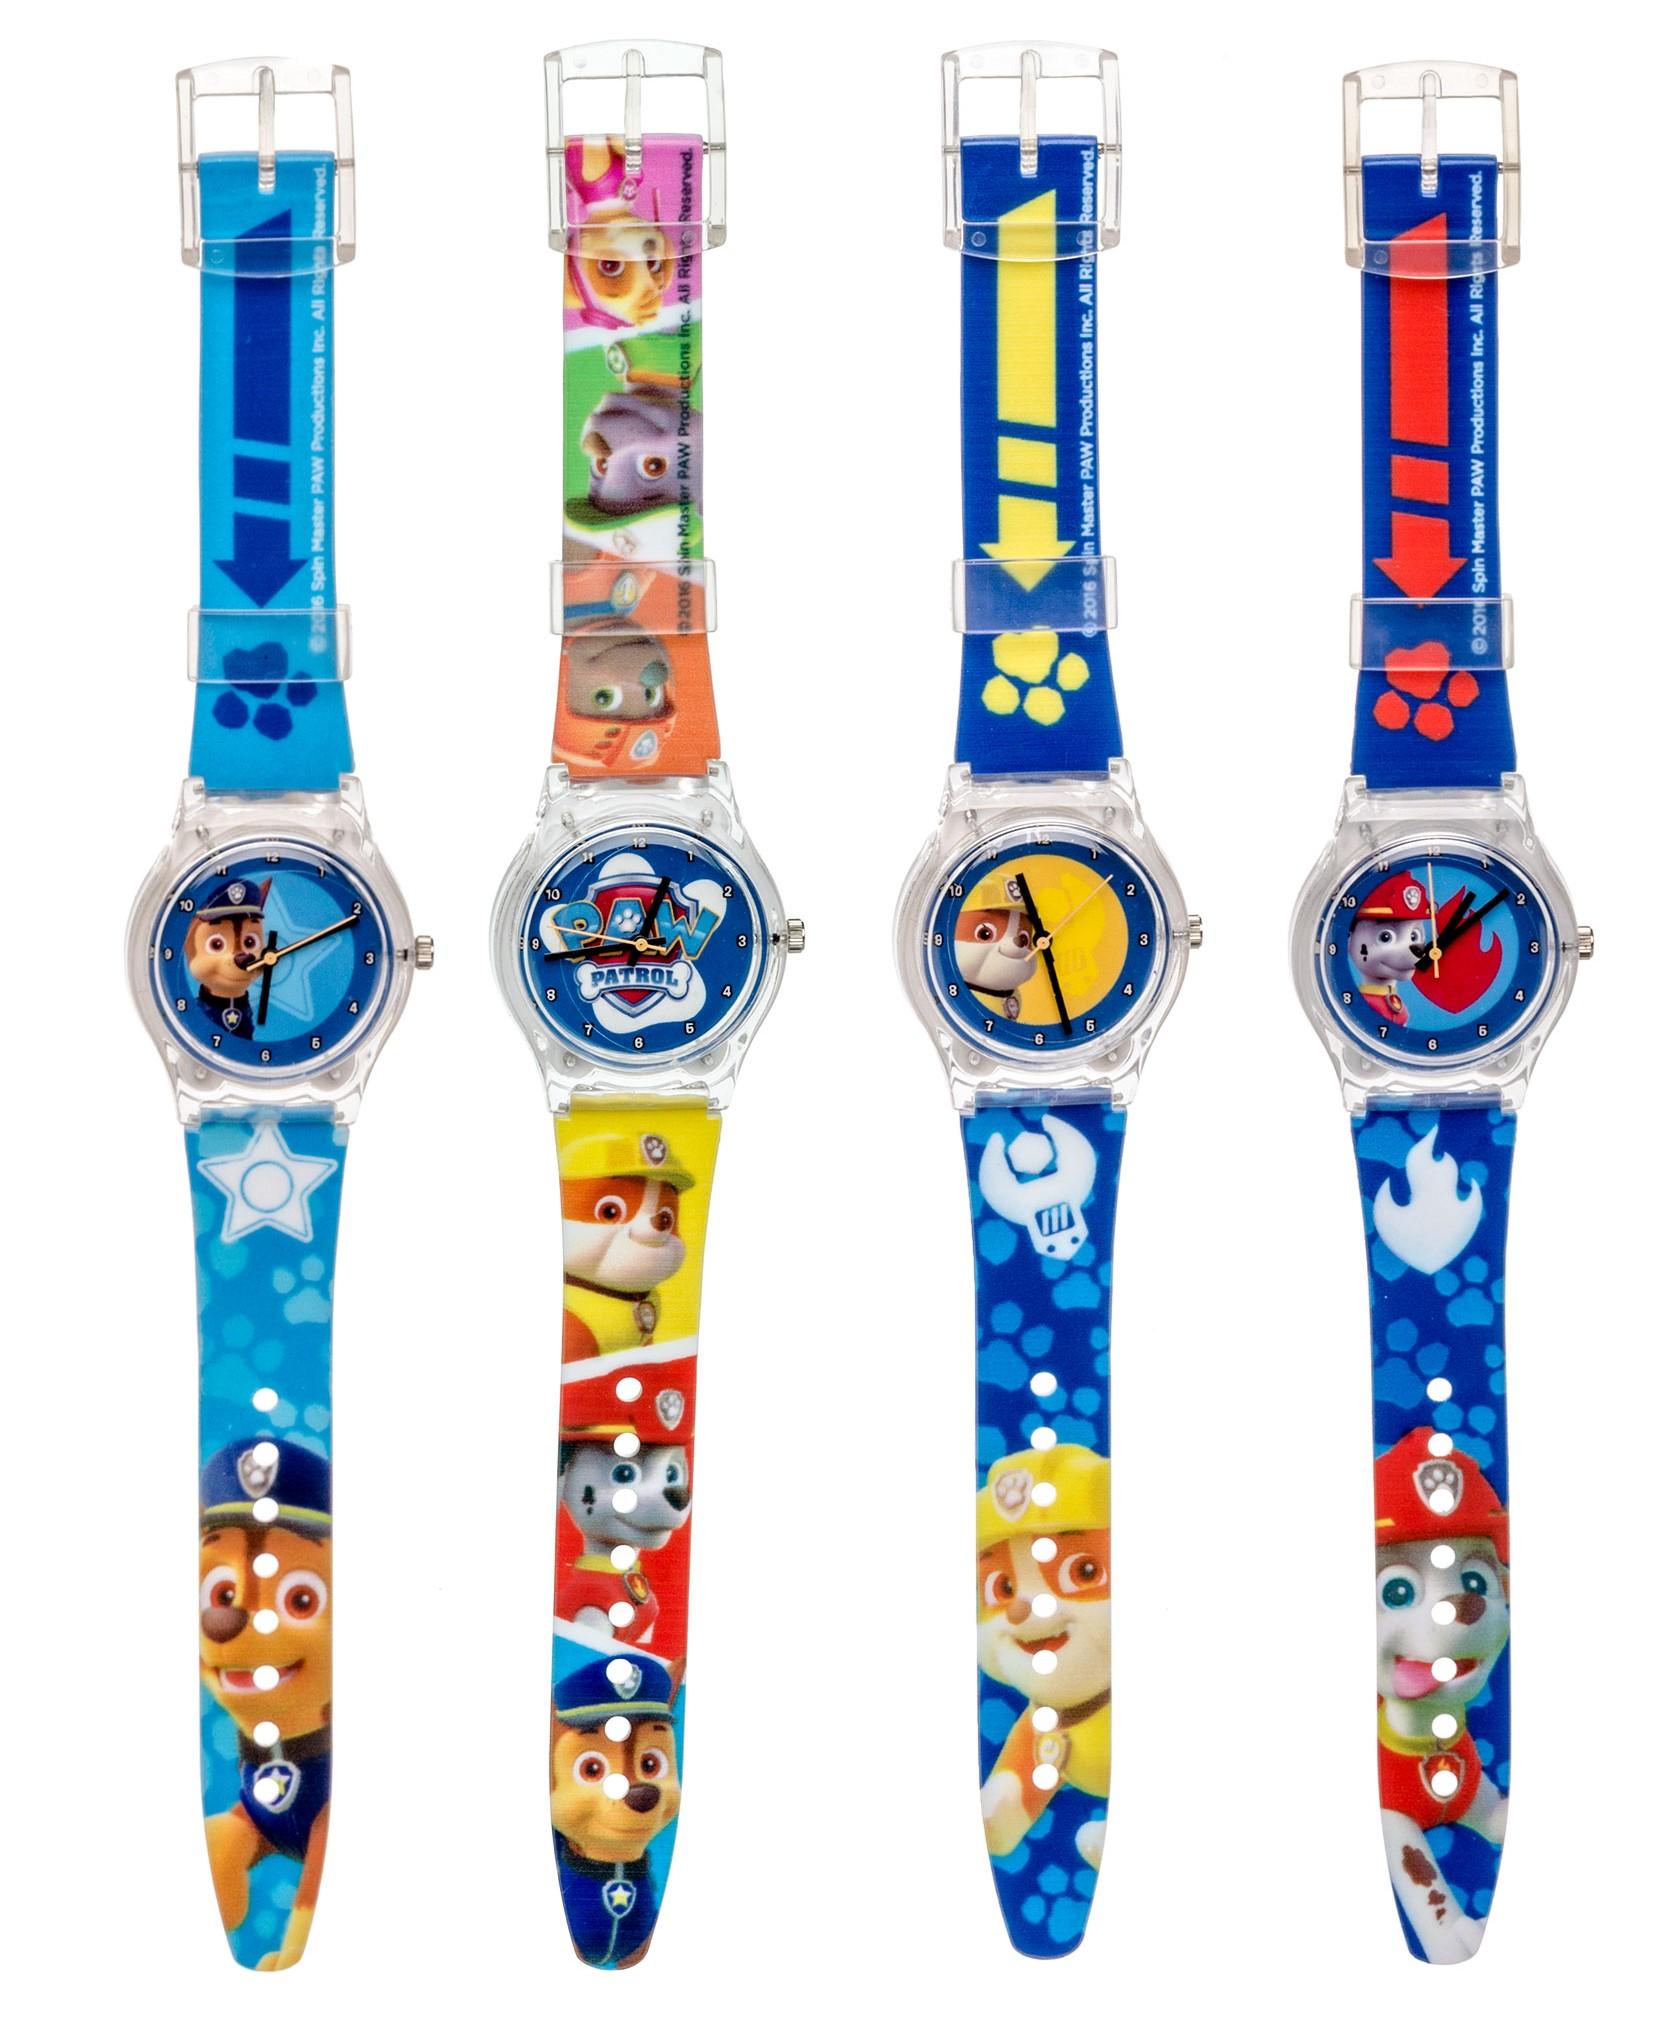 Paw Patrol Kinder-Armbanduhr